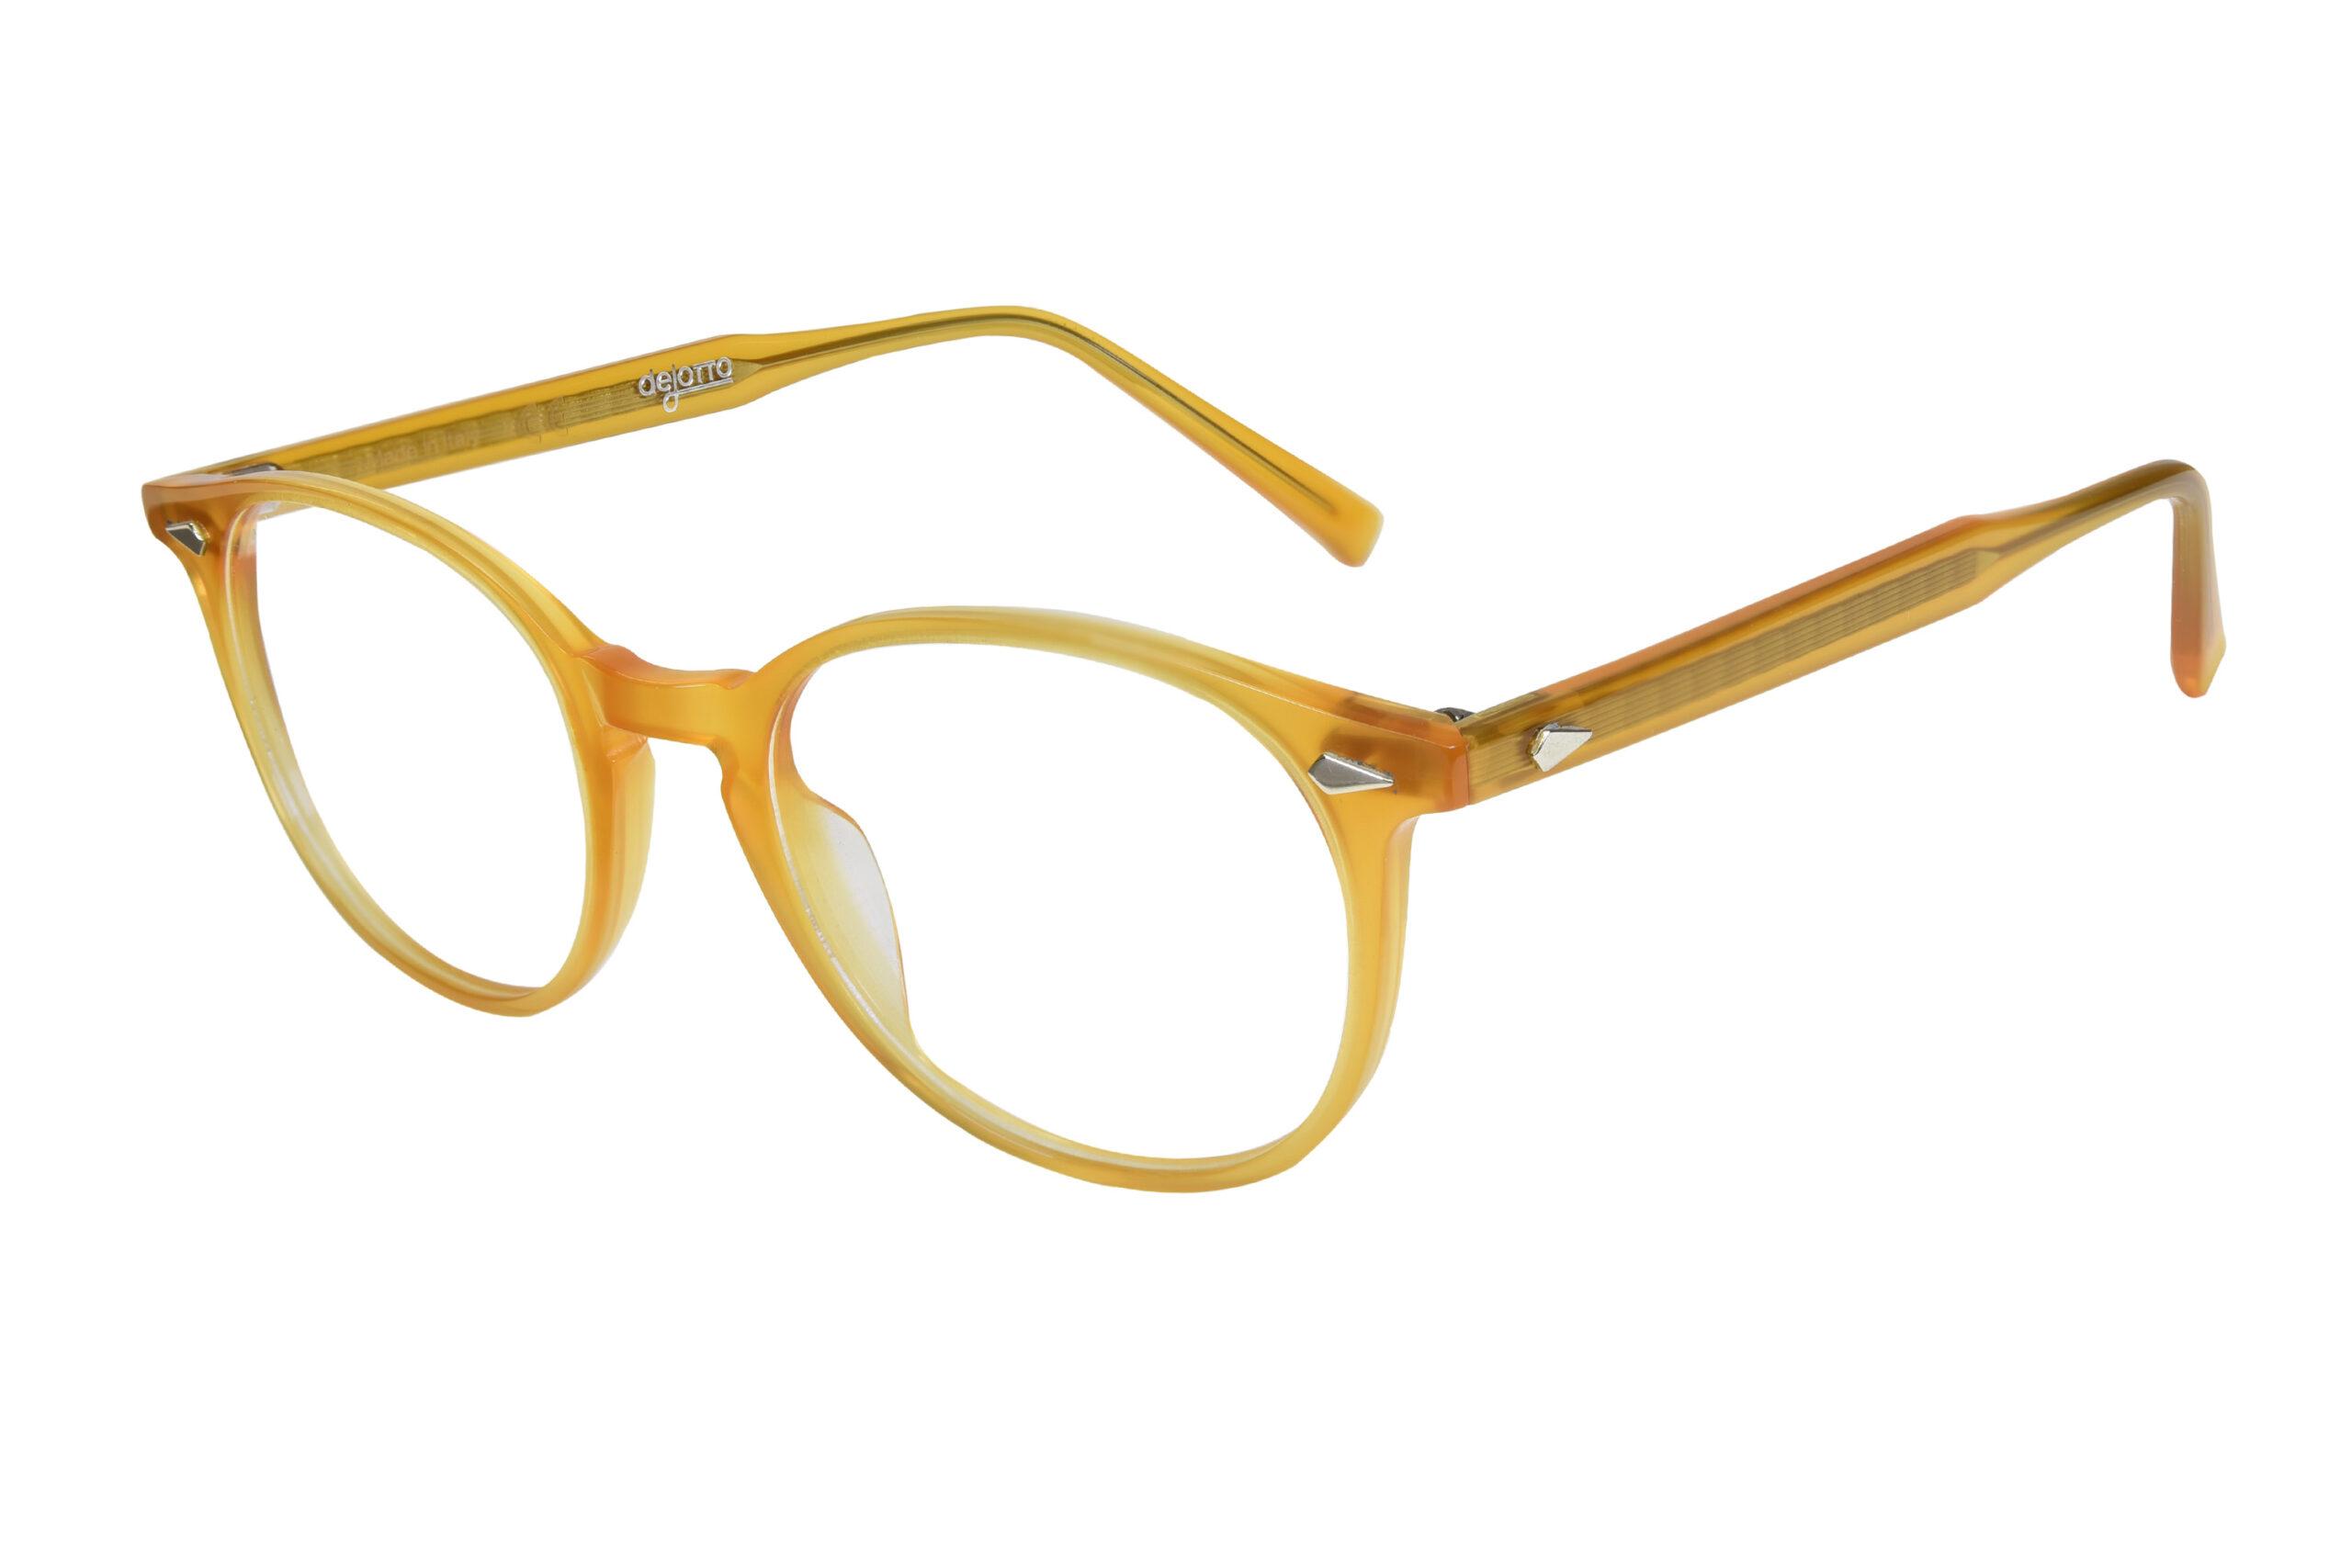 DL 133 c.8006 – Yellow